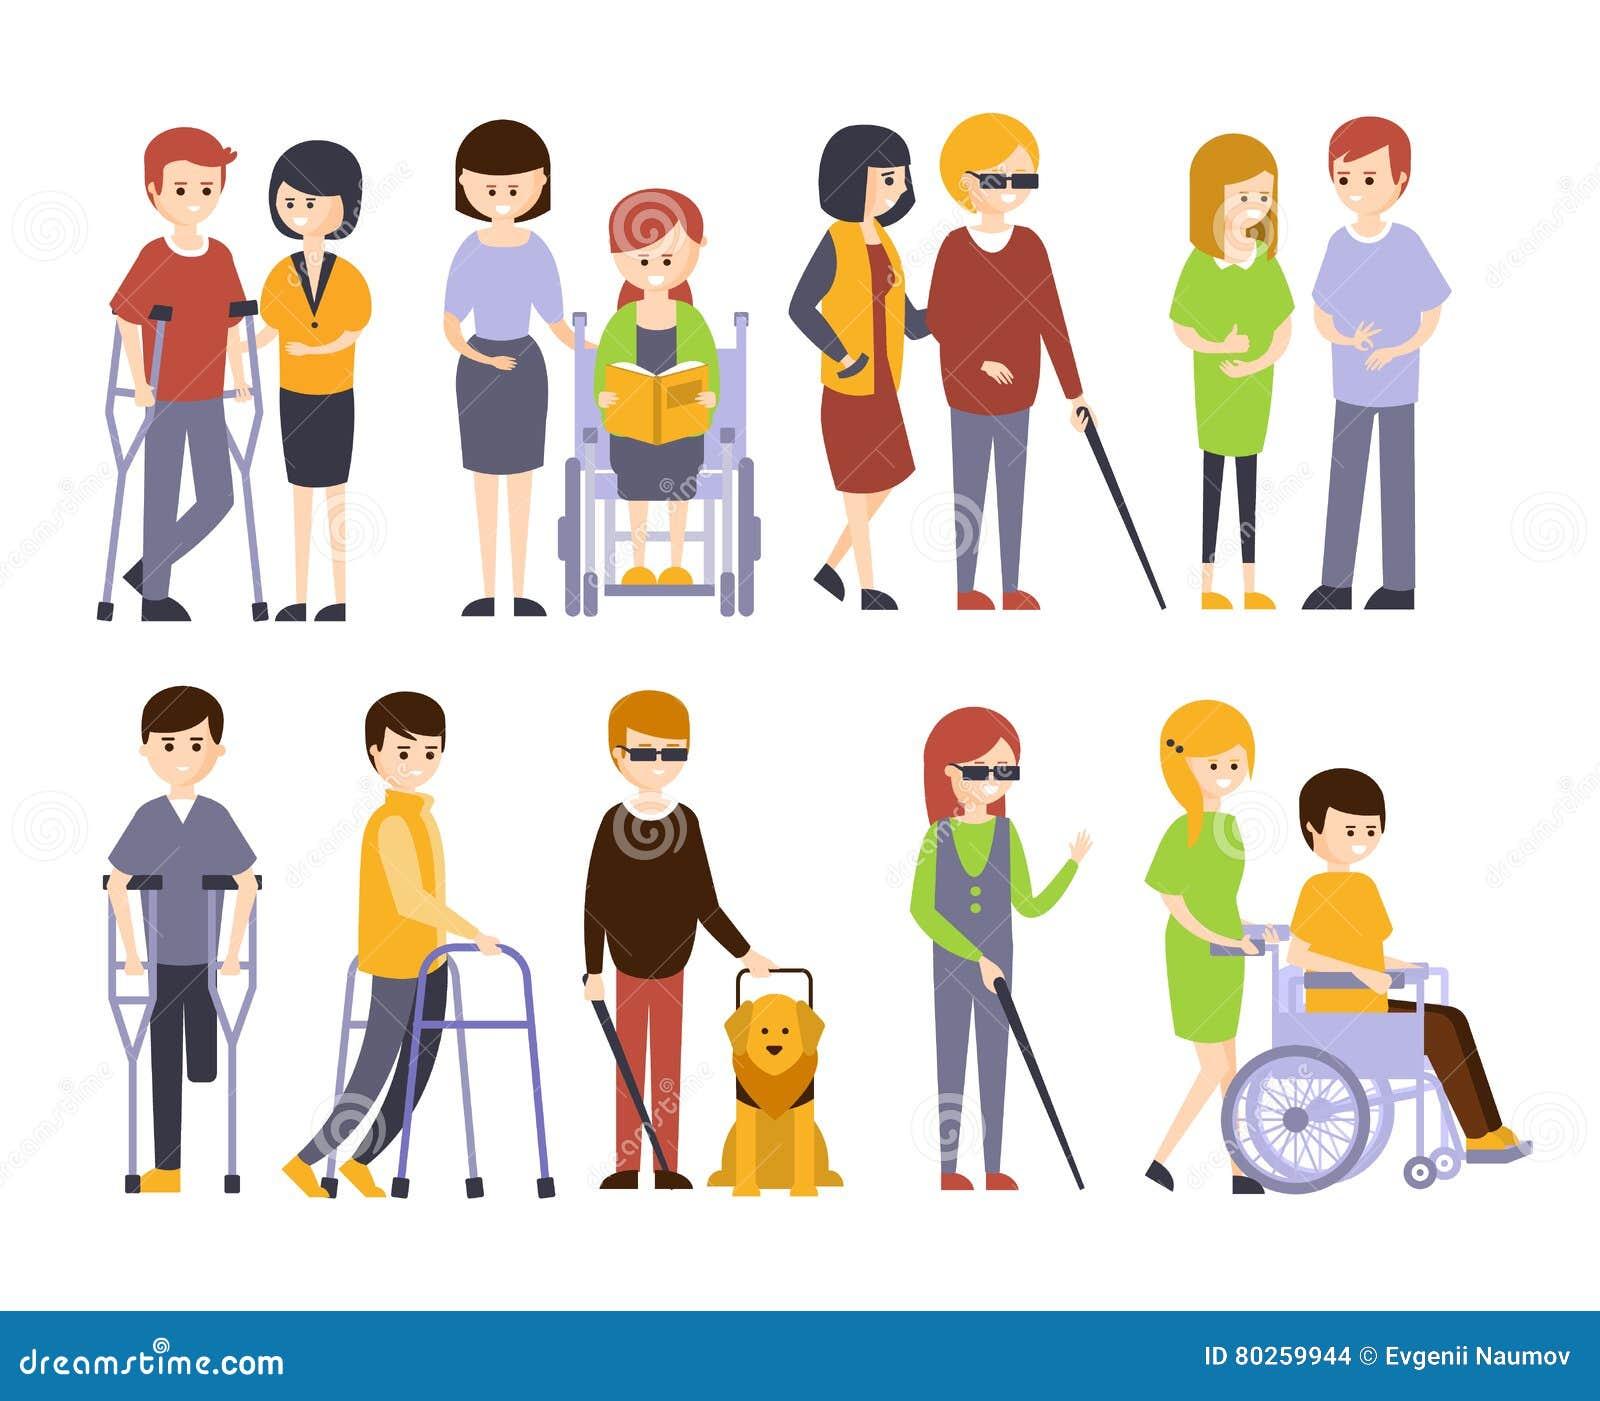 Behinderte dating-sites kostenlos uk